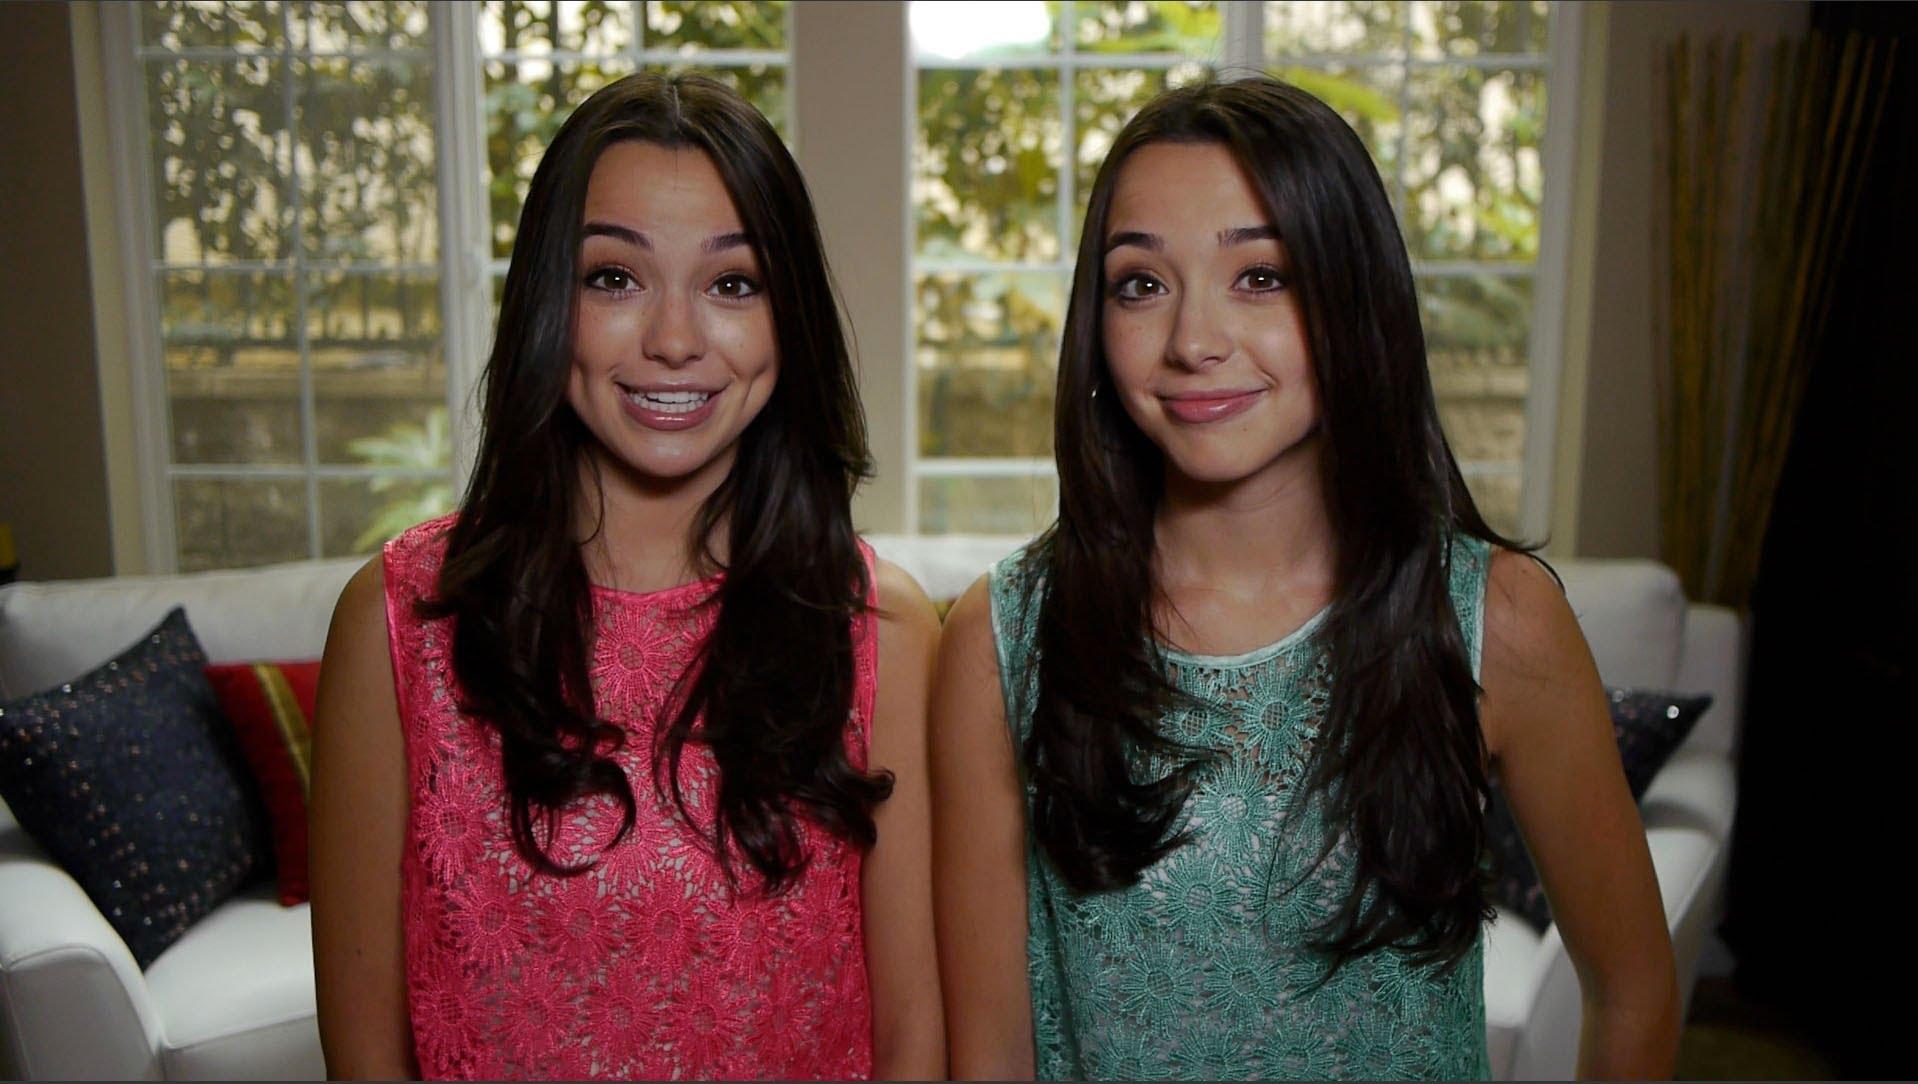 Merrell Twins